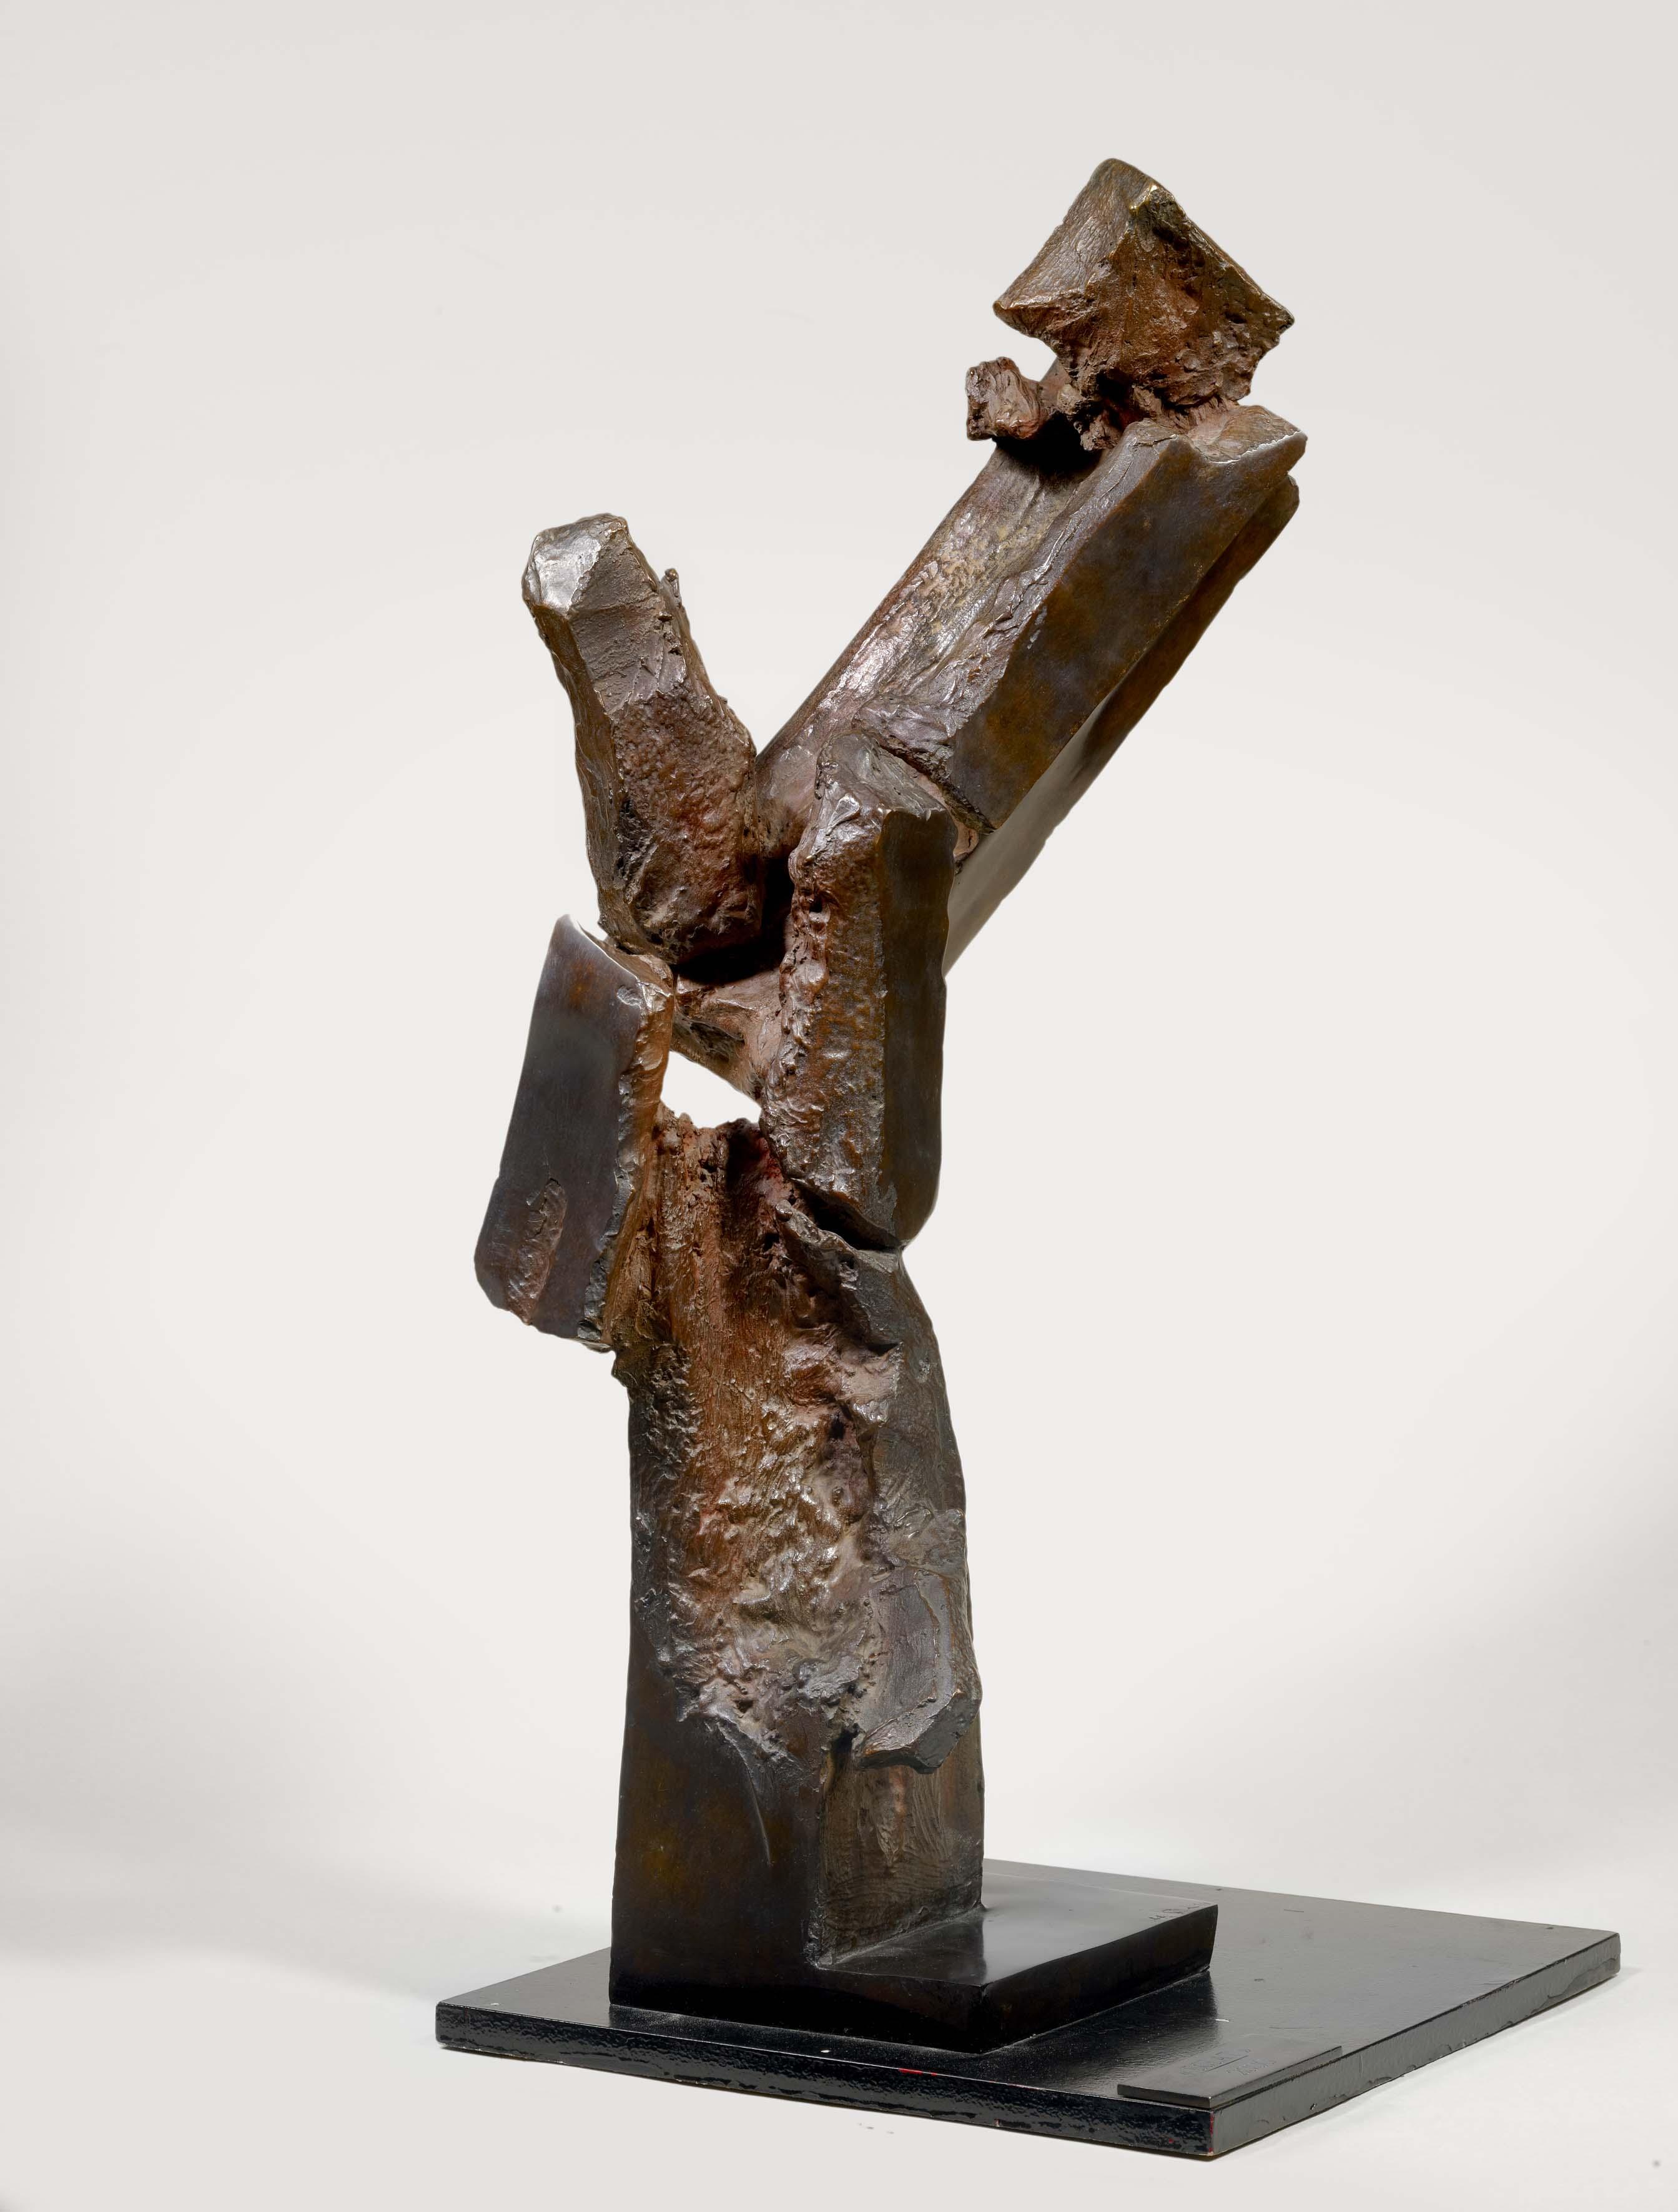 Eclat, 2000 - 2003, 75 x 41 x 18 cm